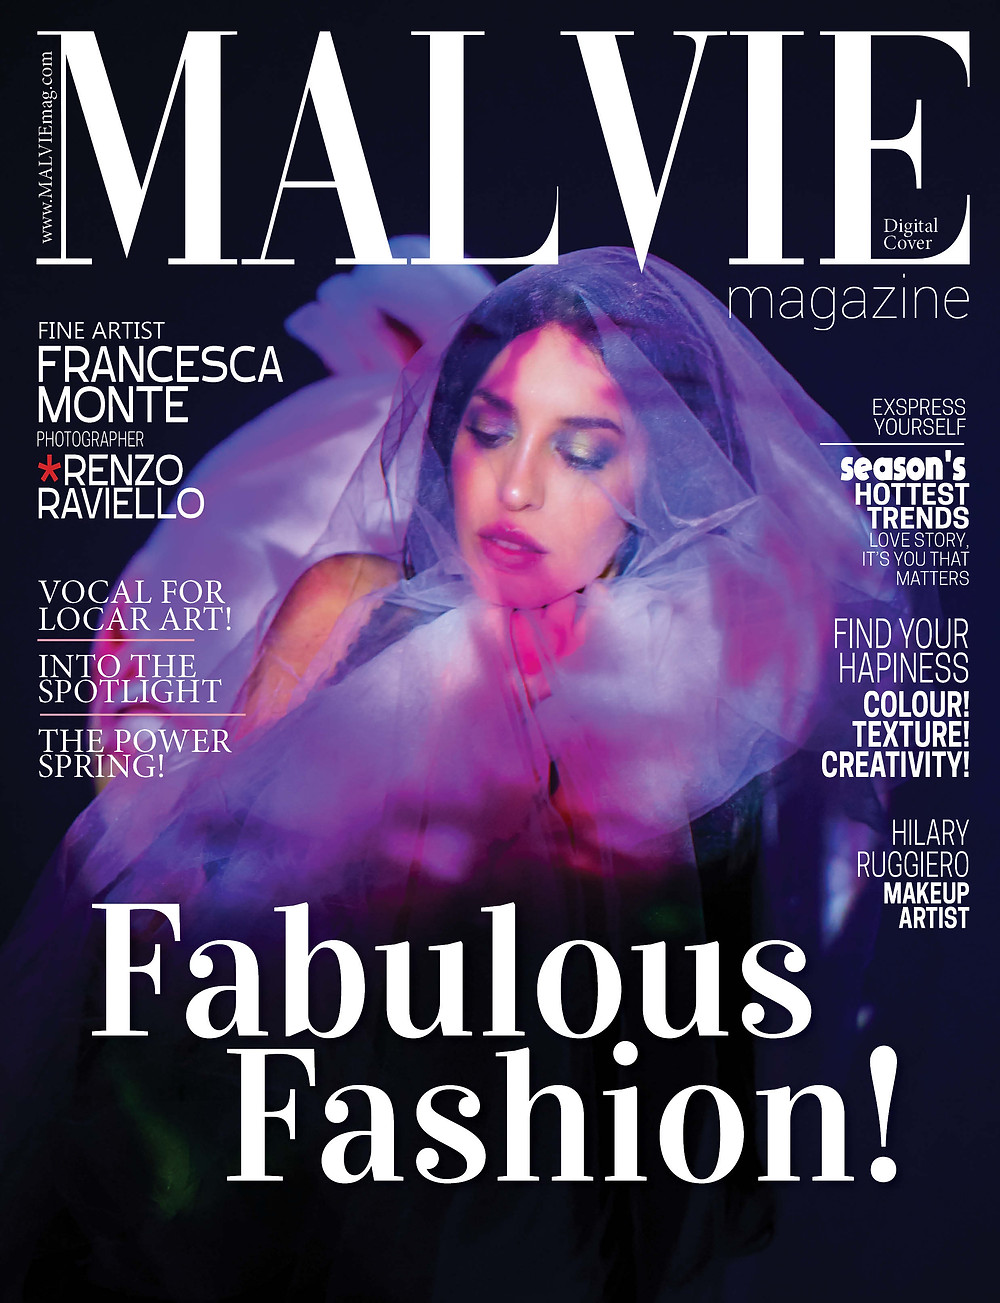 Fine Artist: Francesca Monte  Photographer: Renzo Raviello   Makeup Artist: Hilary Ruggiero  Wardrobe Stylist: Francesca Monte